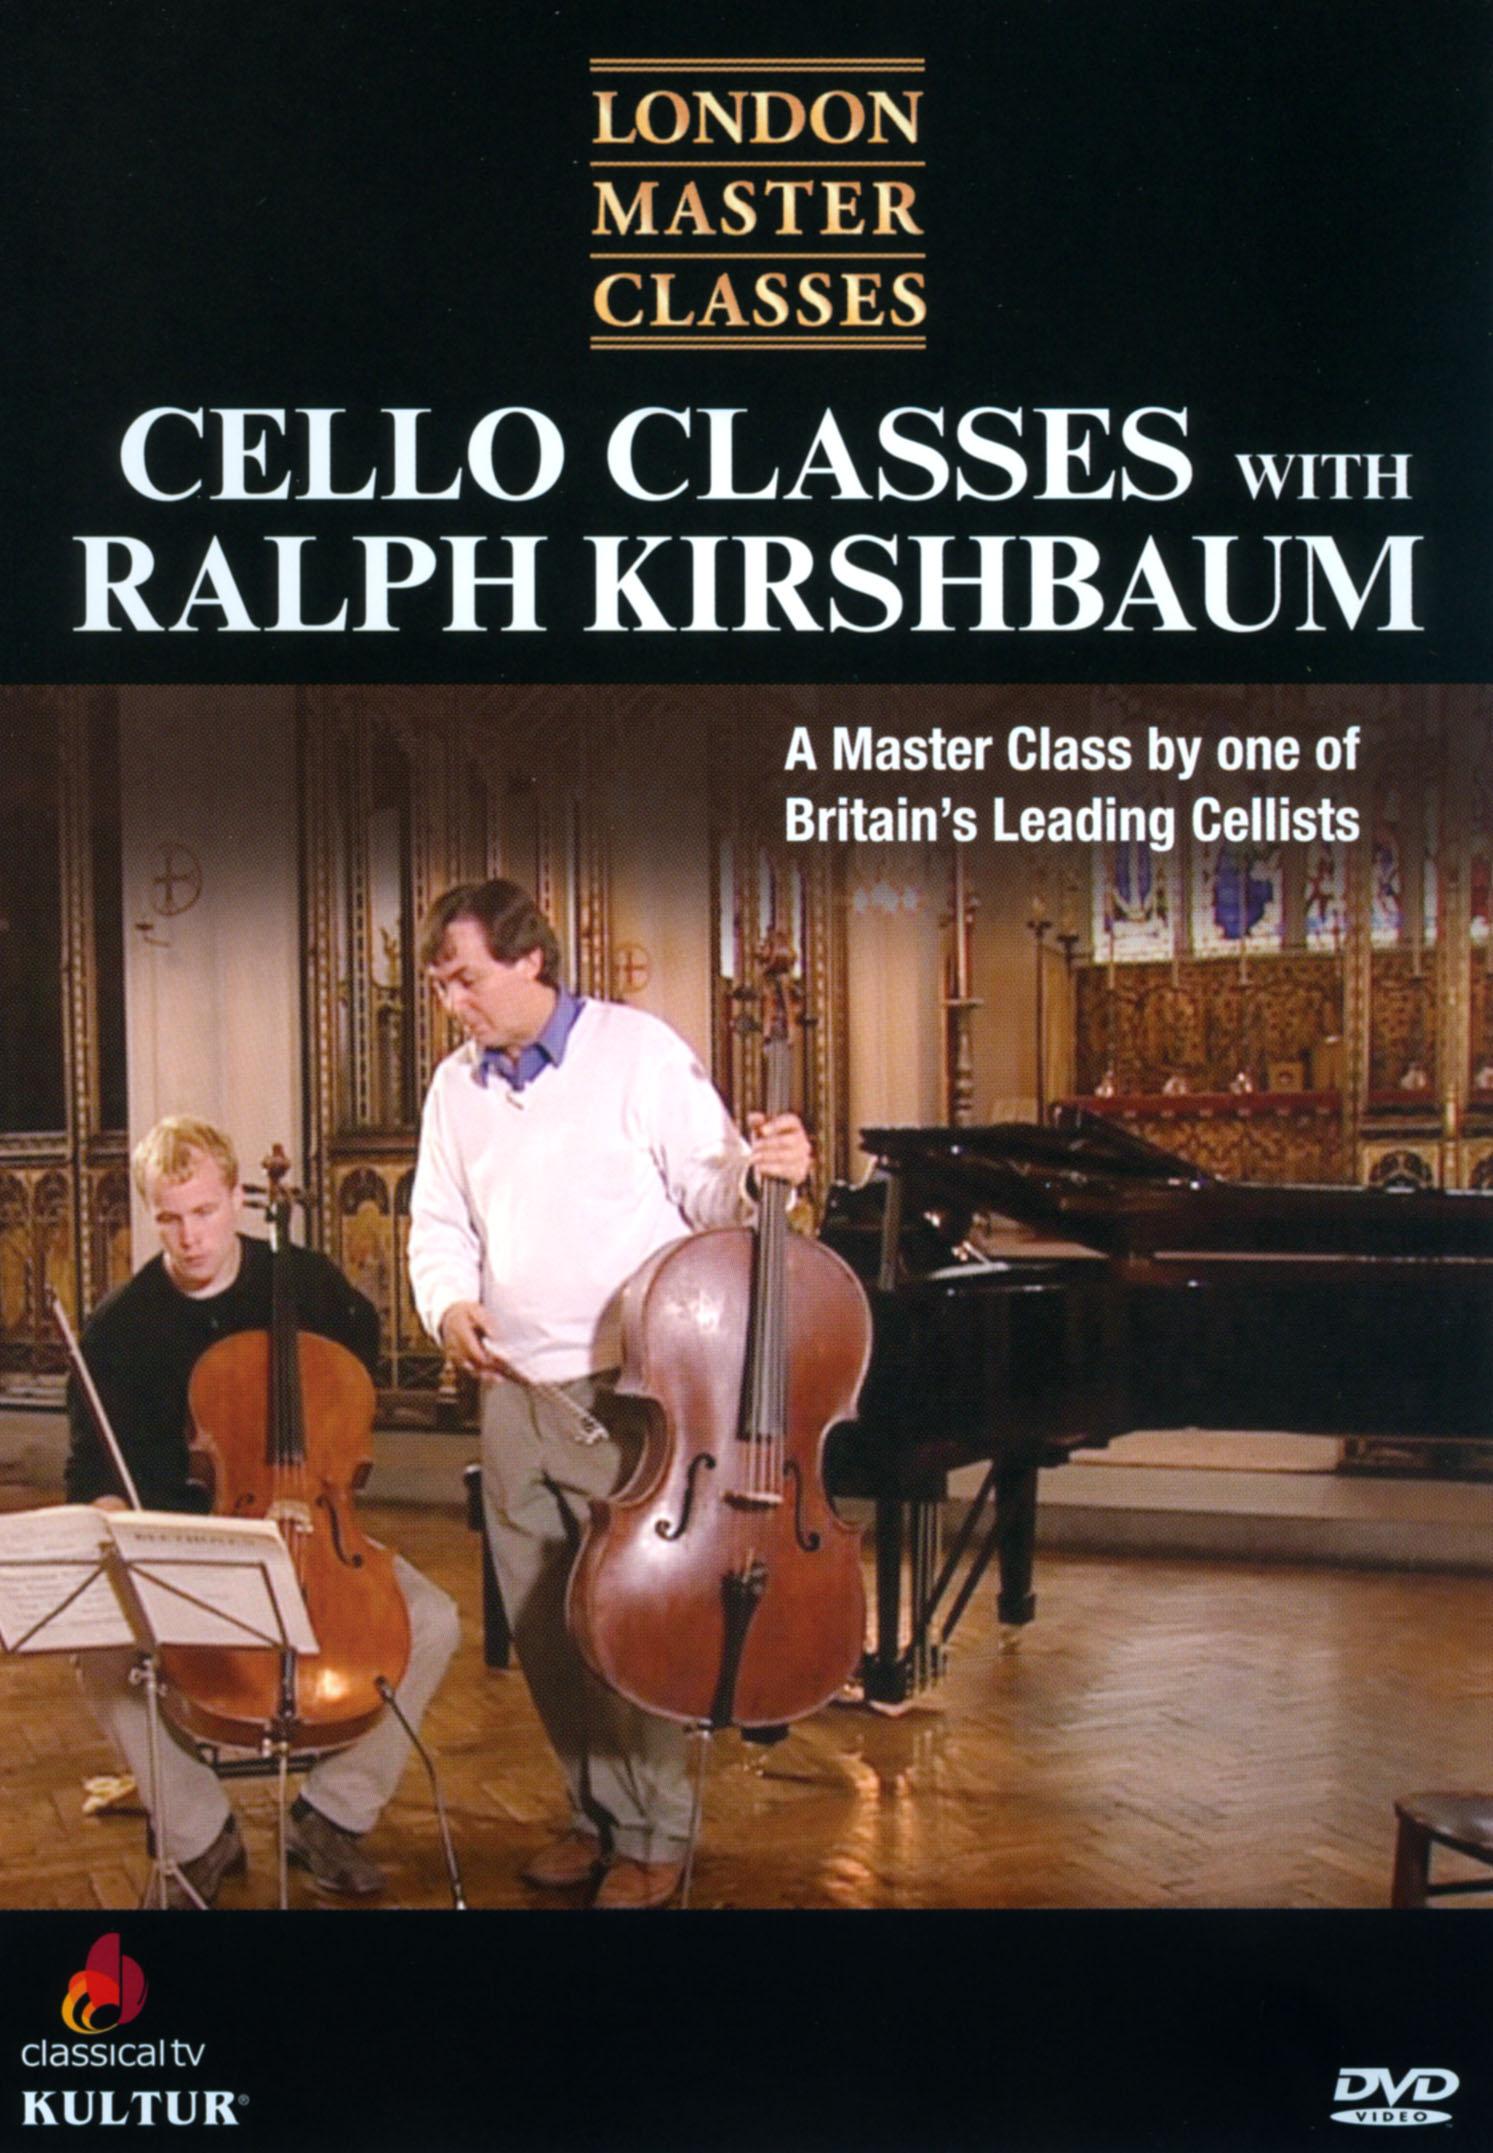 London Master Classes: Cello Classes with Ralph Kirshbaum (2013)